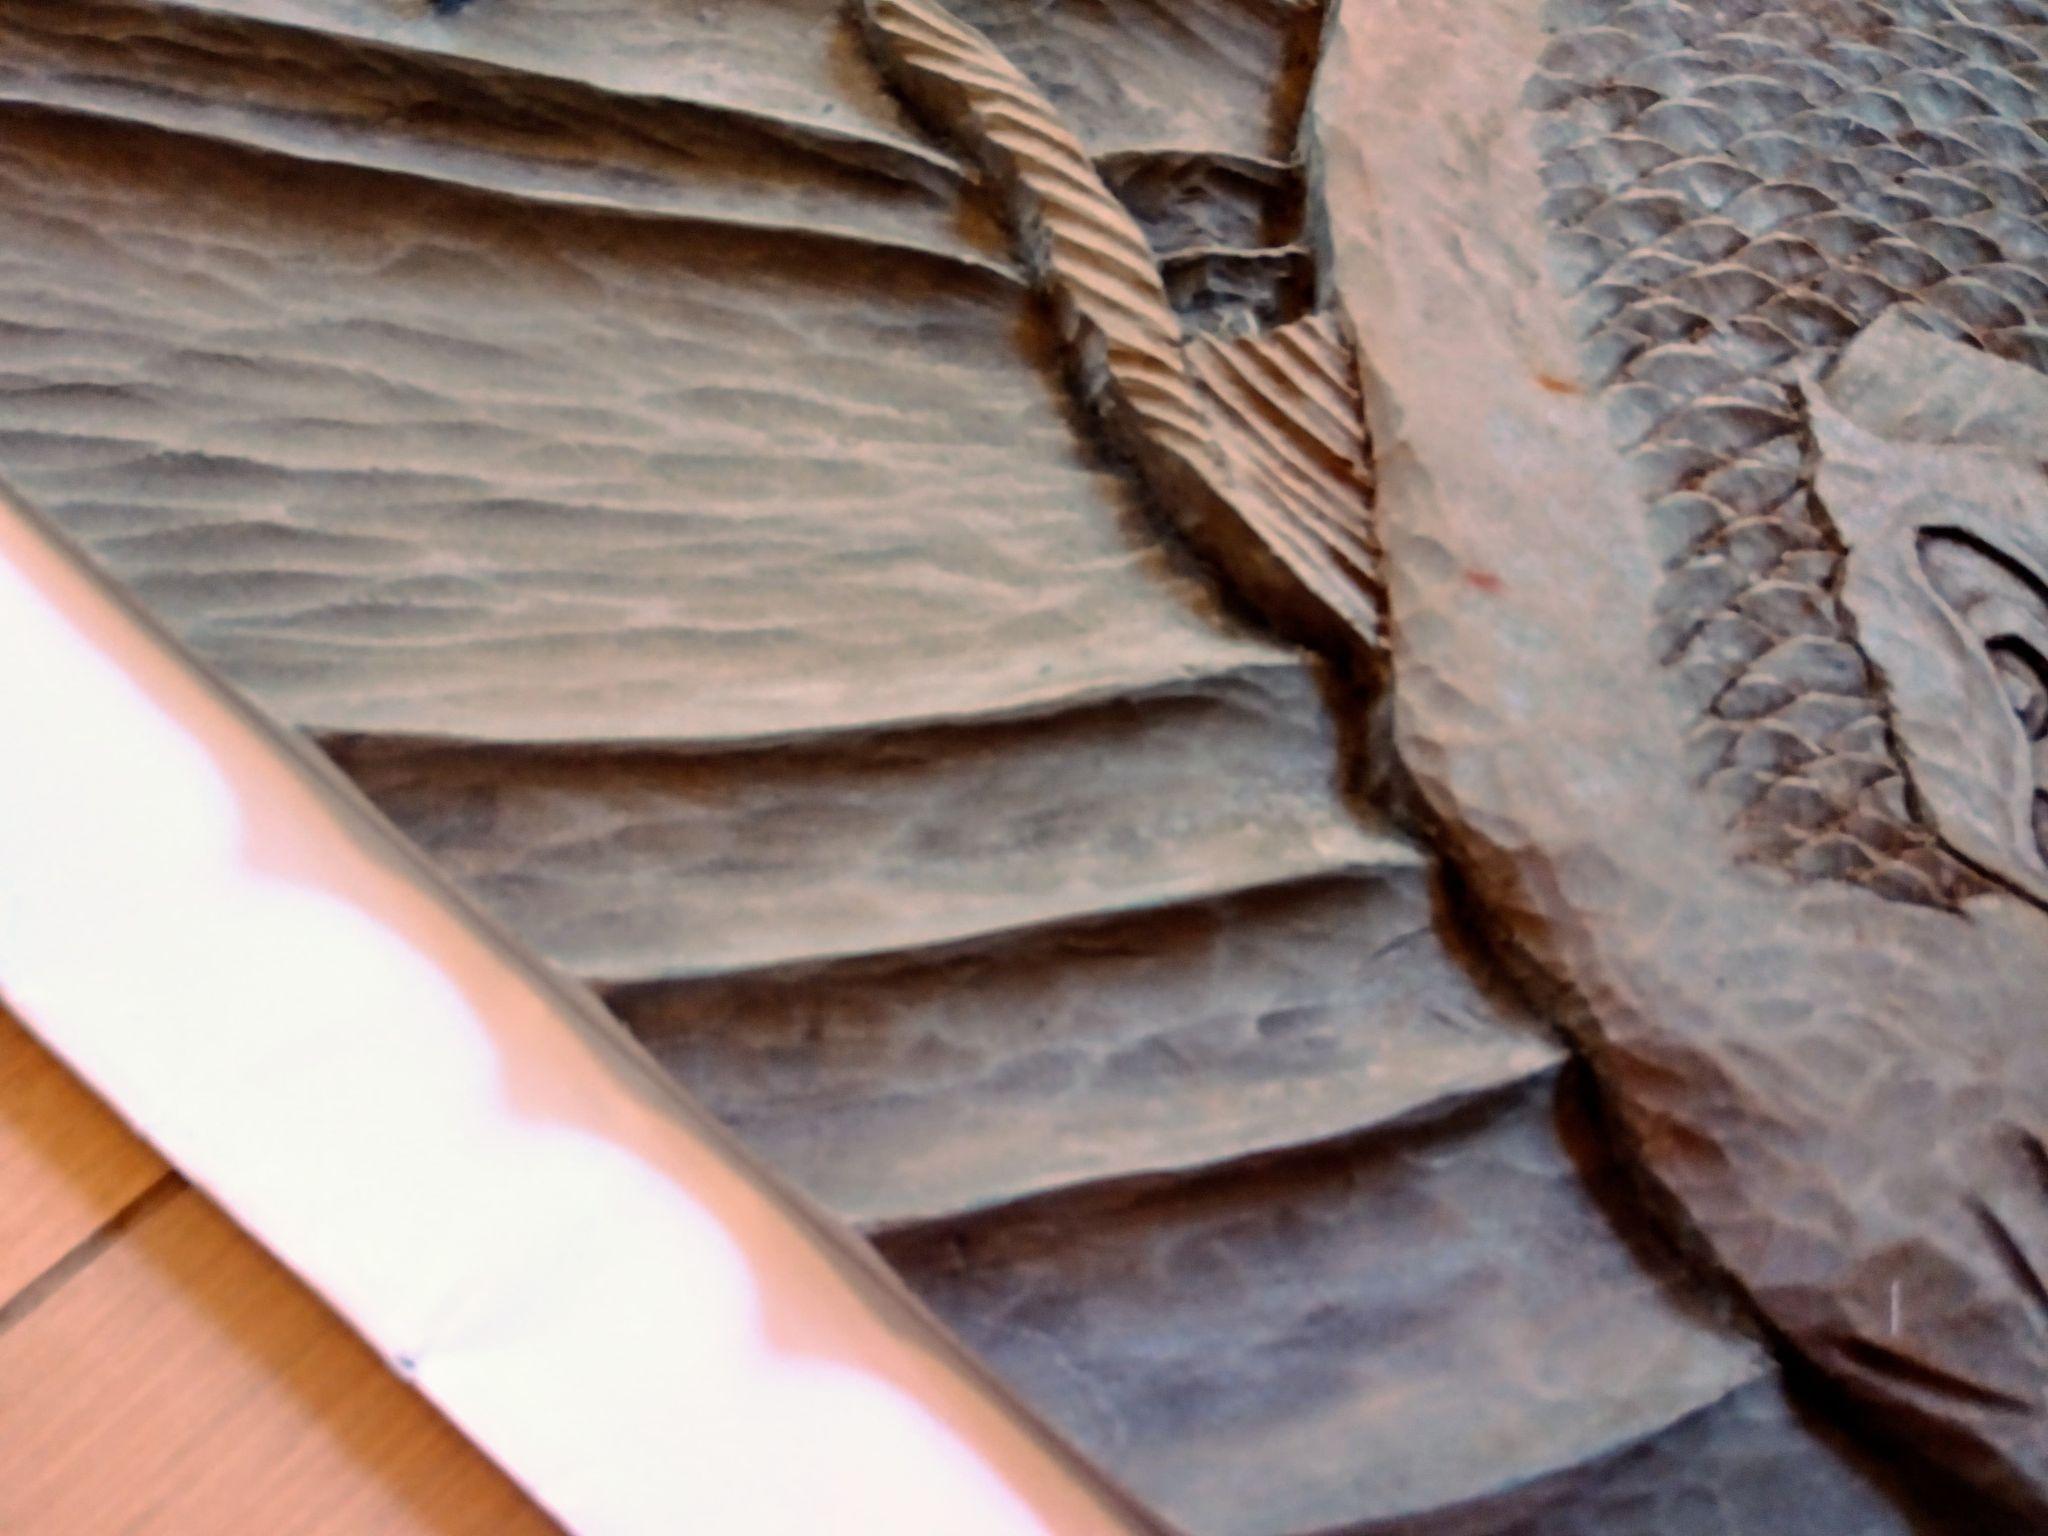 【制作実績】木彫作品『鯉から龍』完成4